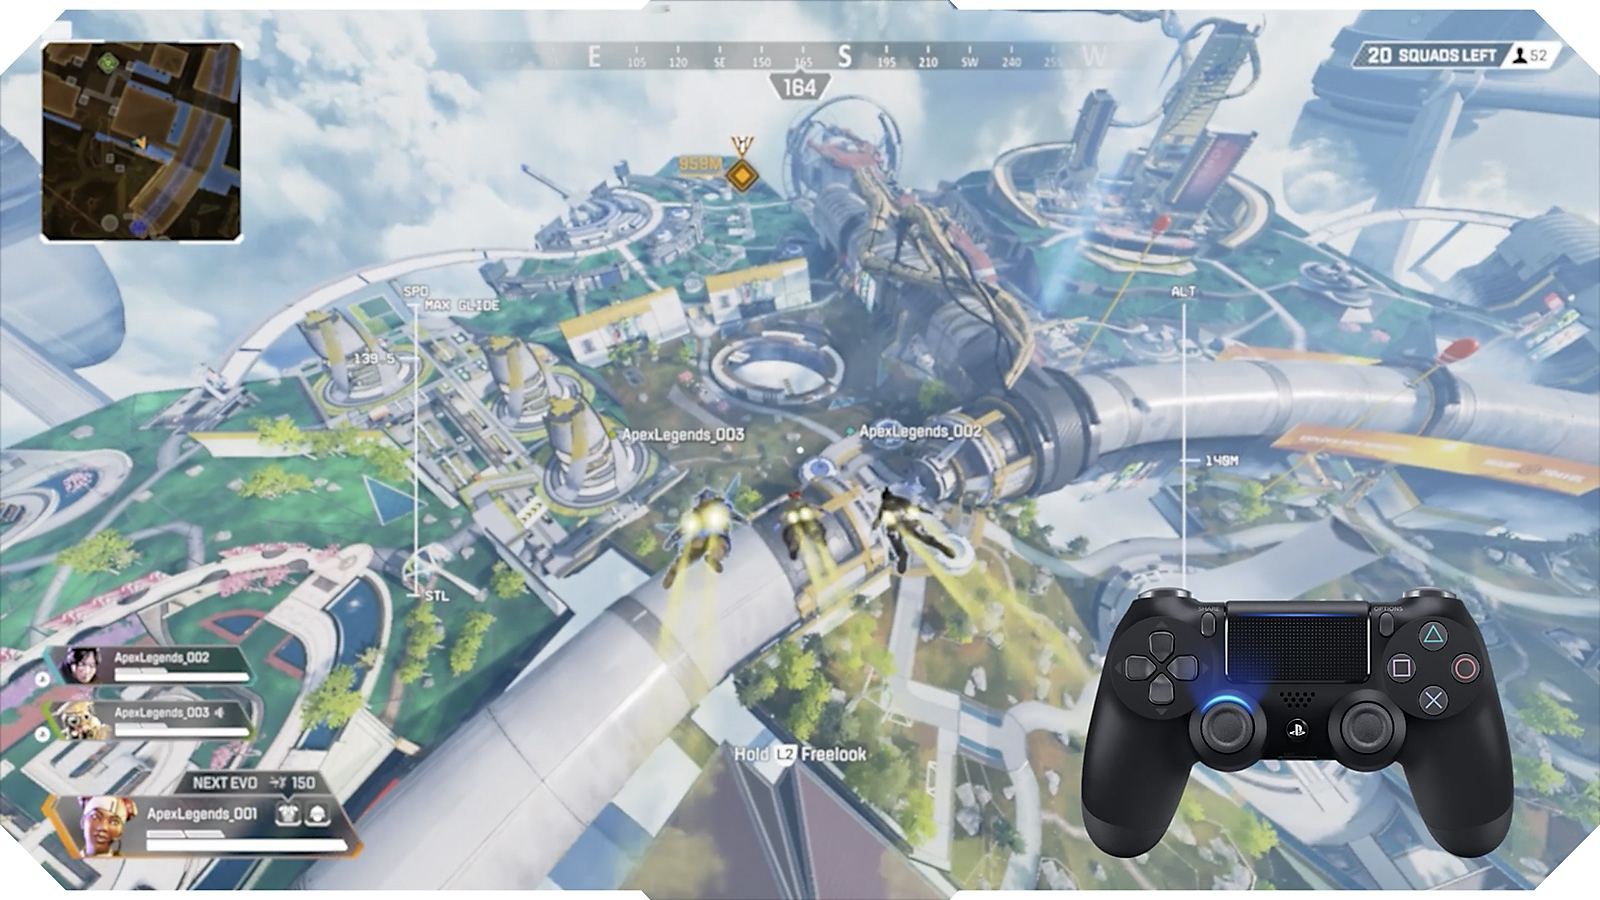 Apex Legends screenshot of Legends dropping into arena